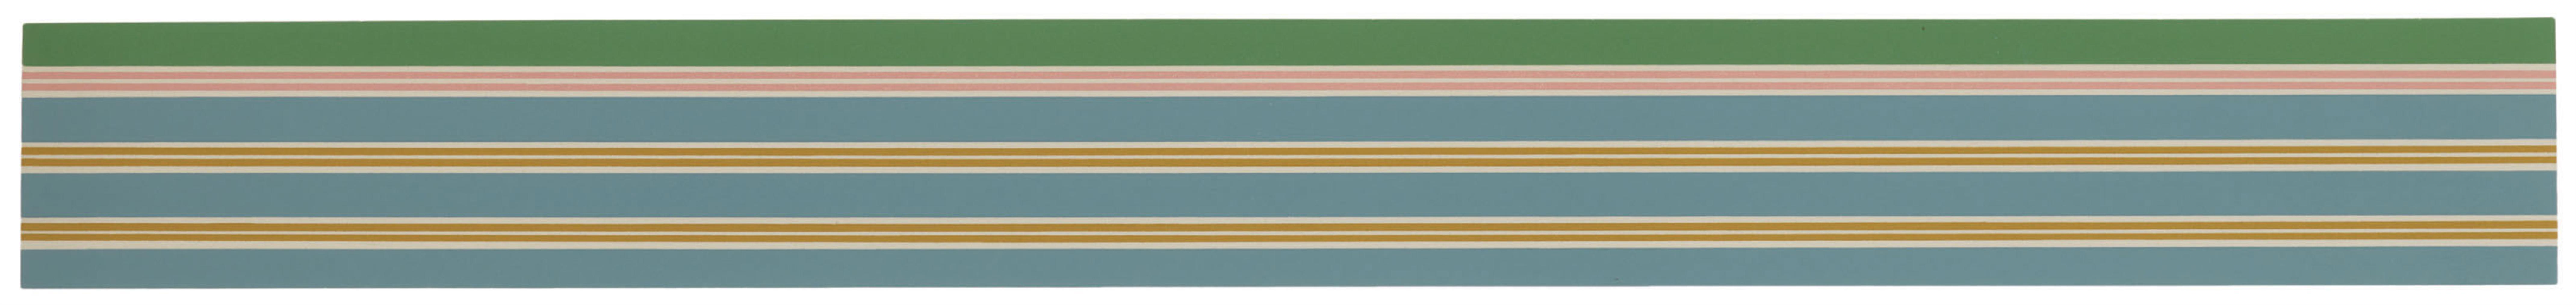 Kenneth Noland-Twin Planes-1969